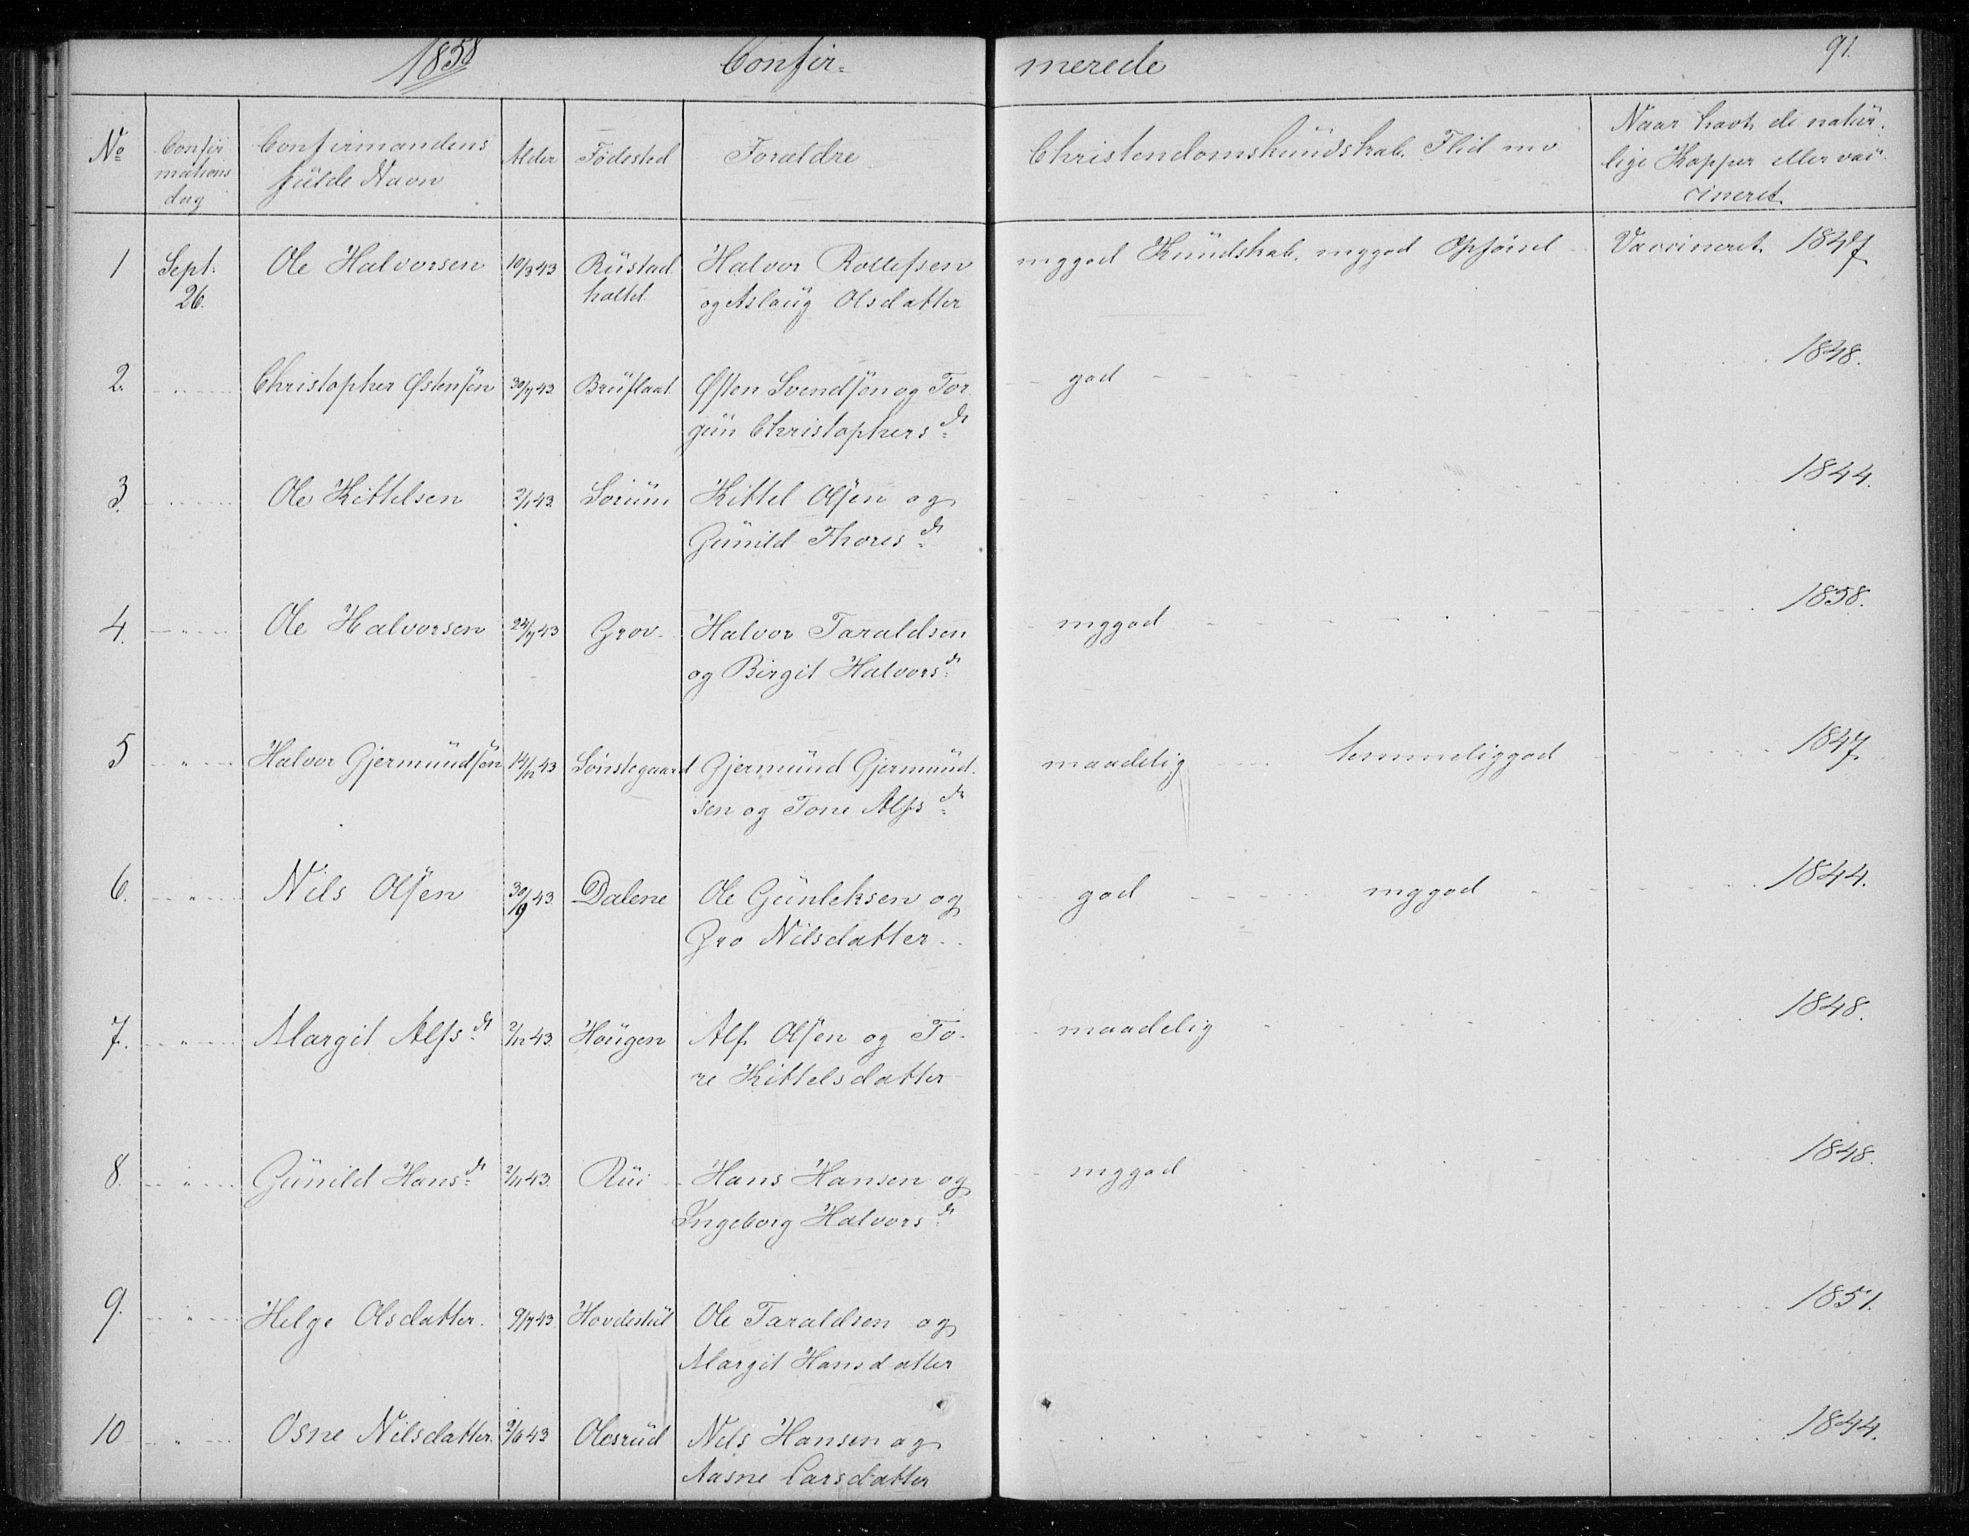 SAKO, Gransherad kirkebøker, F/Fb/L0003: Ministerialbok nr. II 3, 1844-1859, s. 91